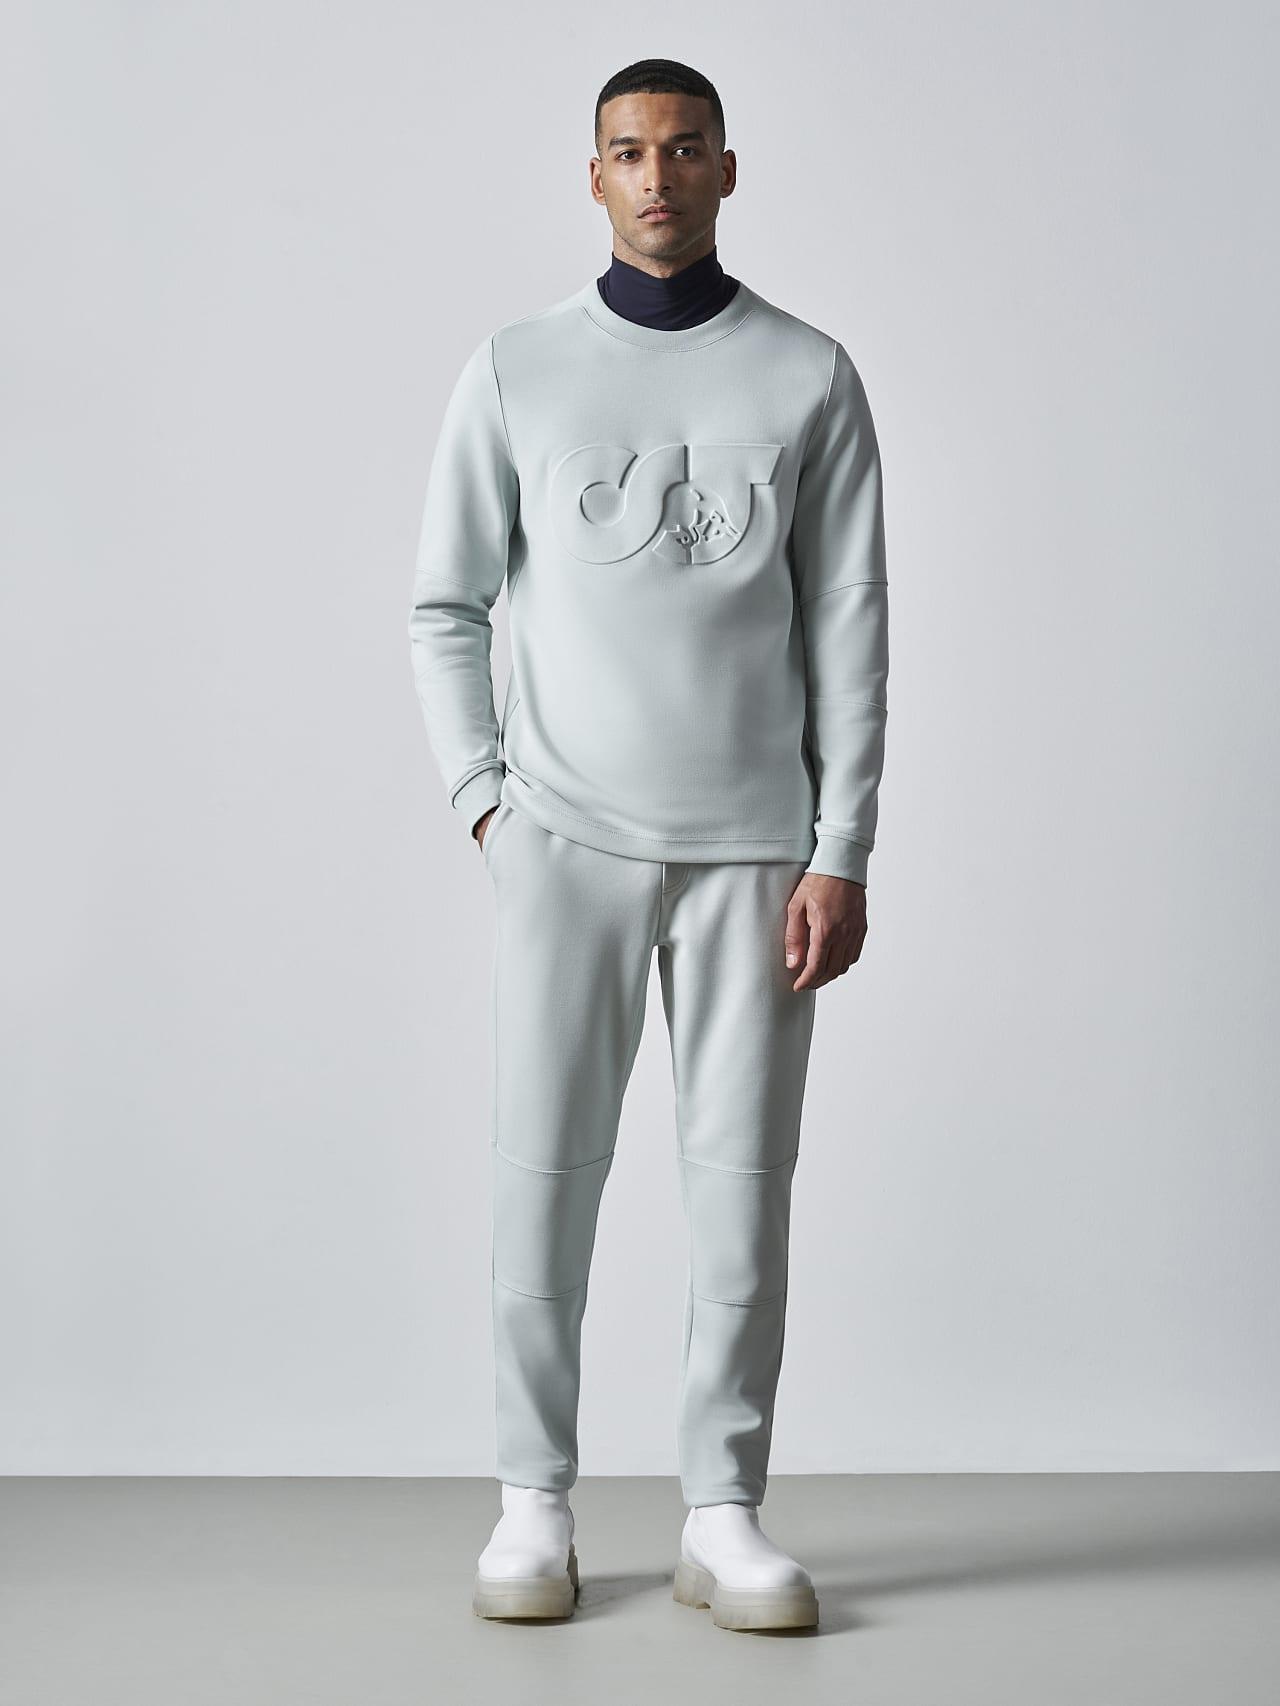 SCONA V1.Y5.02 Premium Sweatshirt Blass Blau Vorne Alpha Tauri